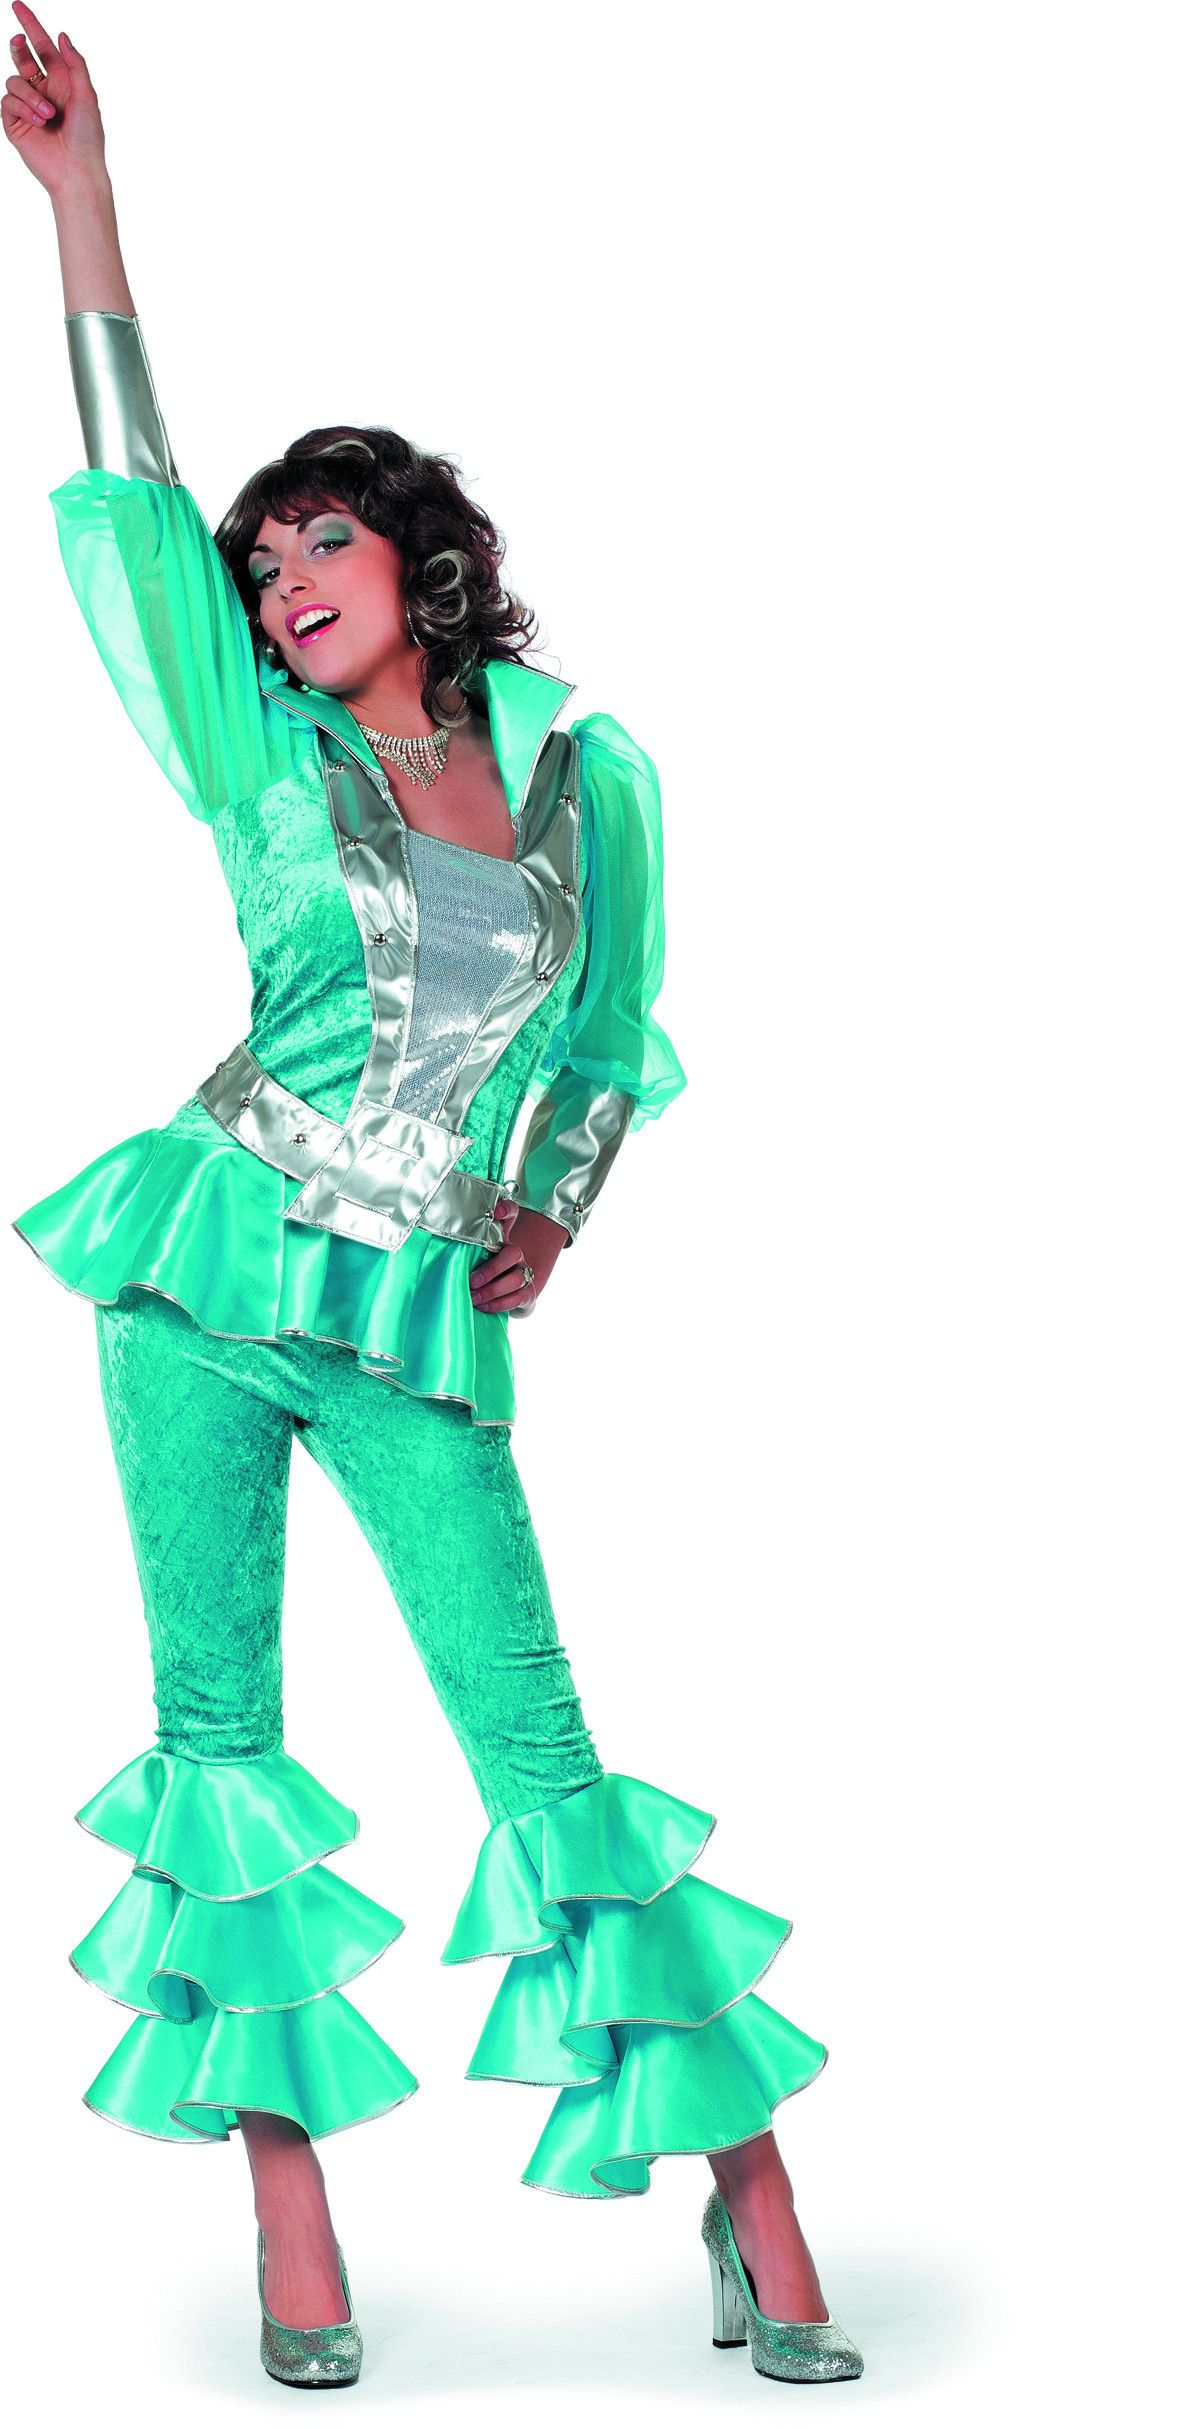 Zweedse Mamma Mia Luxe Aqua Vrouw Kostuum